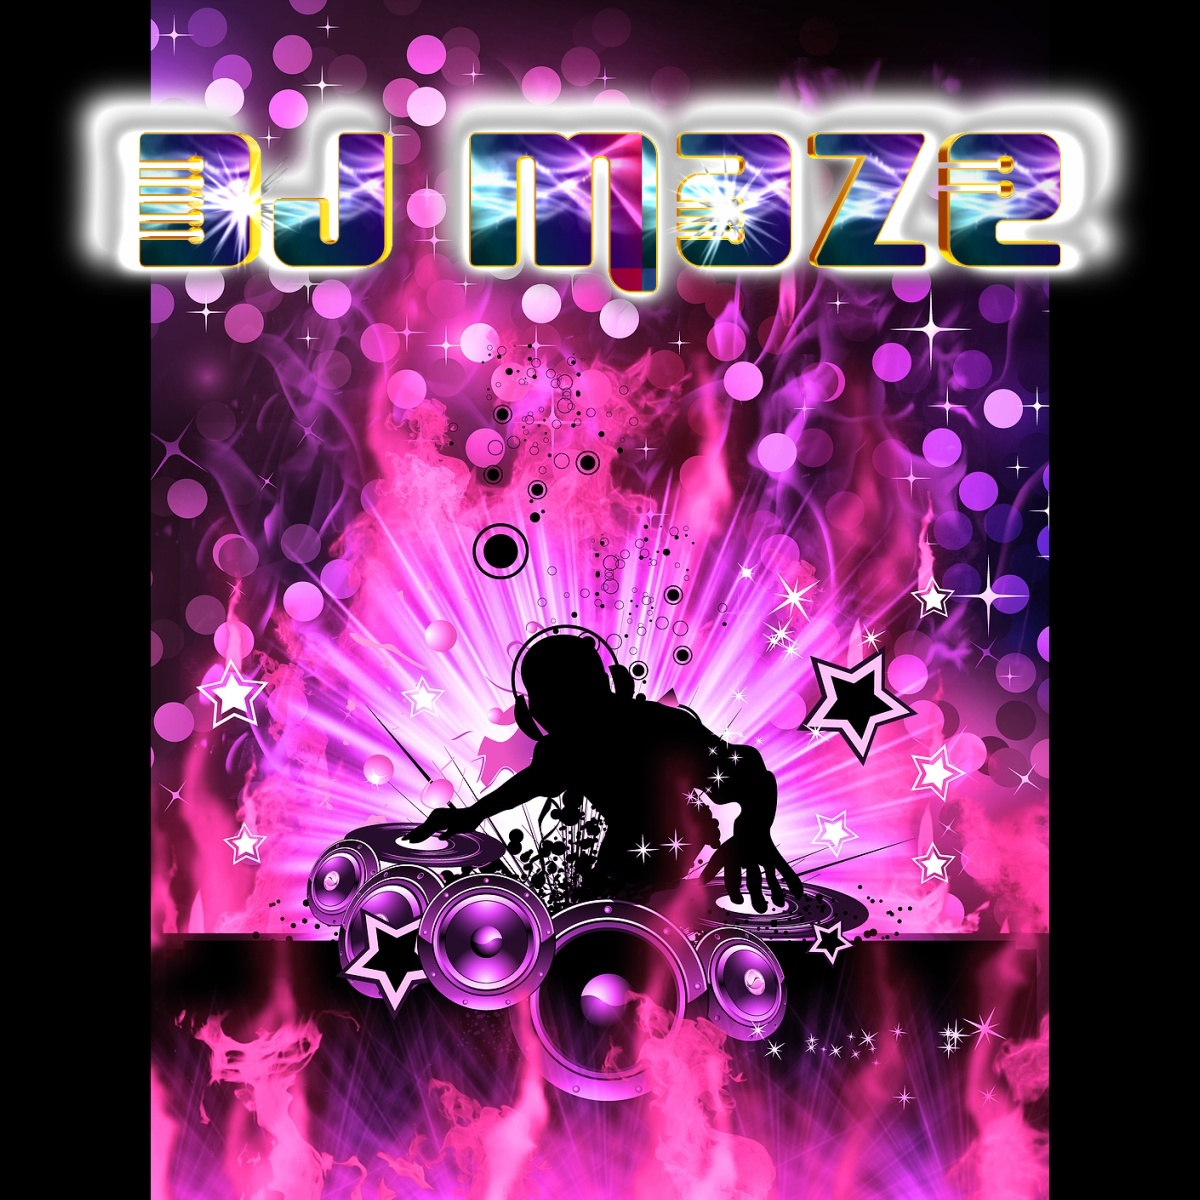 http://2.bp.blogspot.com/-WxwVjIUSERo/TyvDwA40BvI/AAAAAAAABVE/7D5Bkl3YSRo/s1600/Maze%2BPurple%2BFire%2B2-Large.jpg